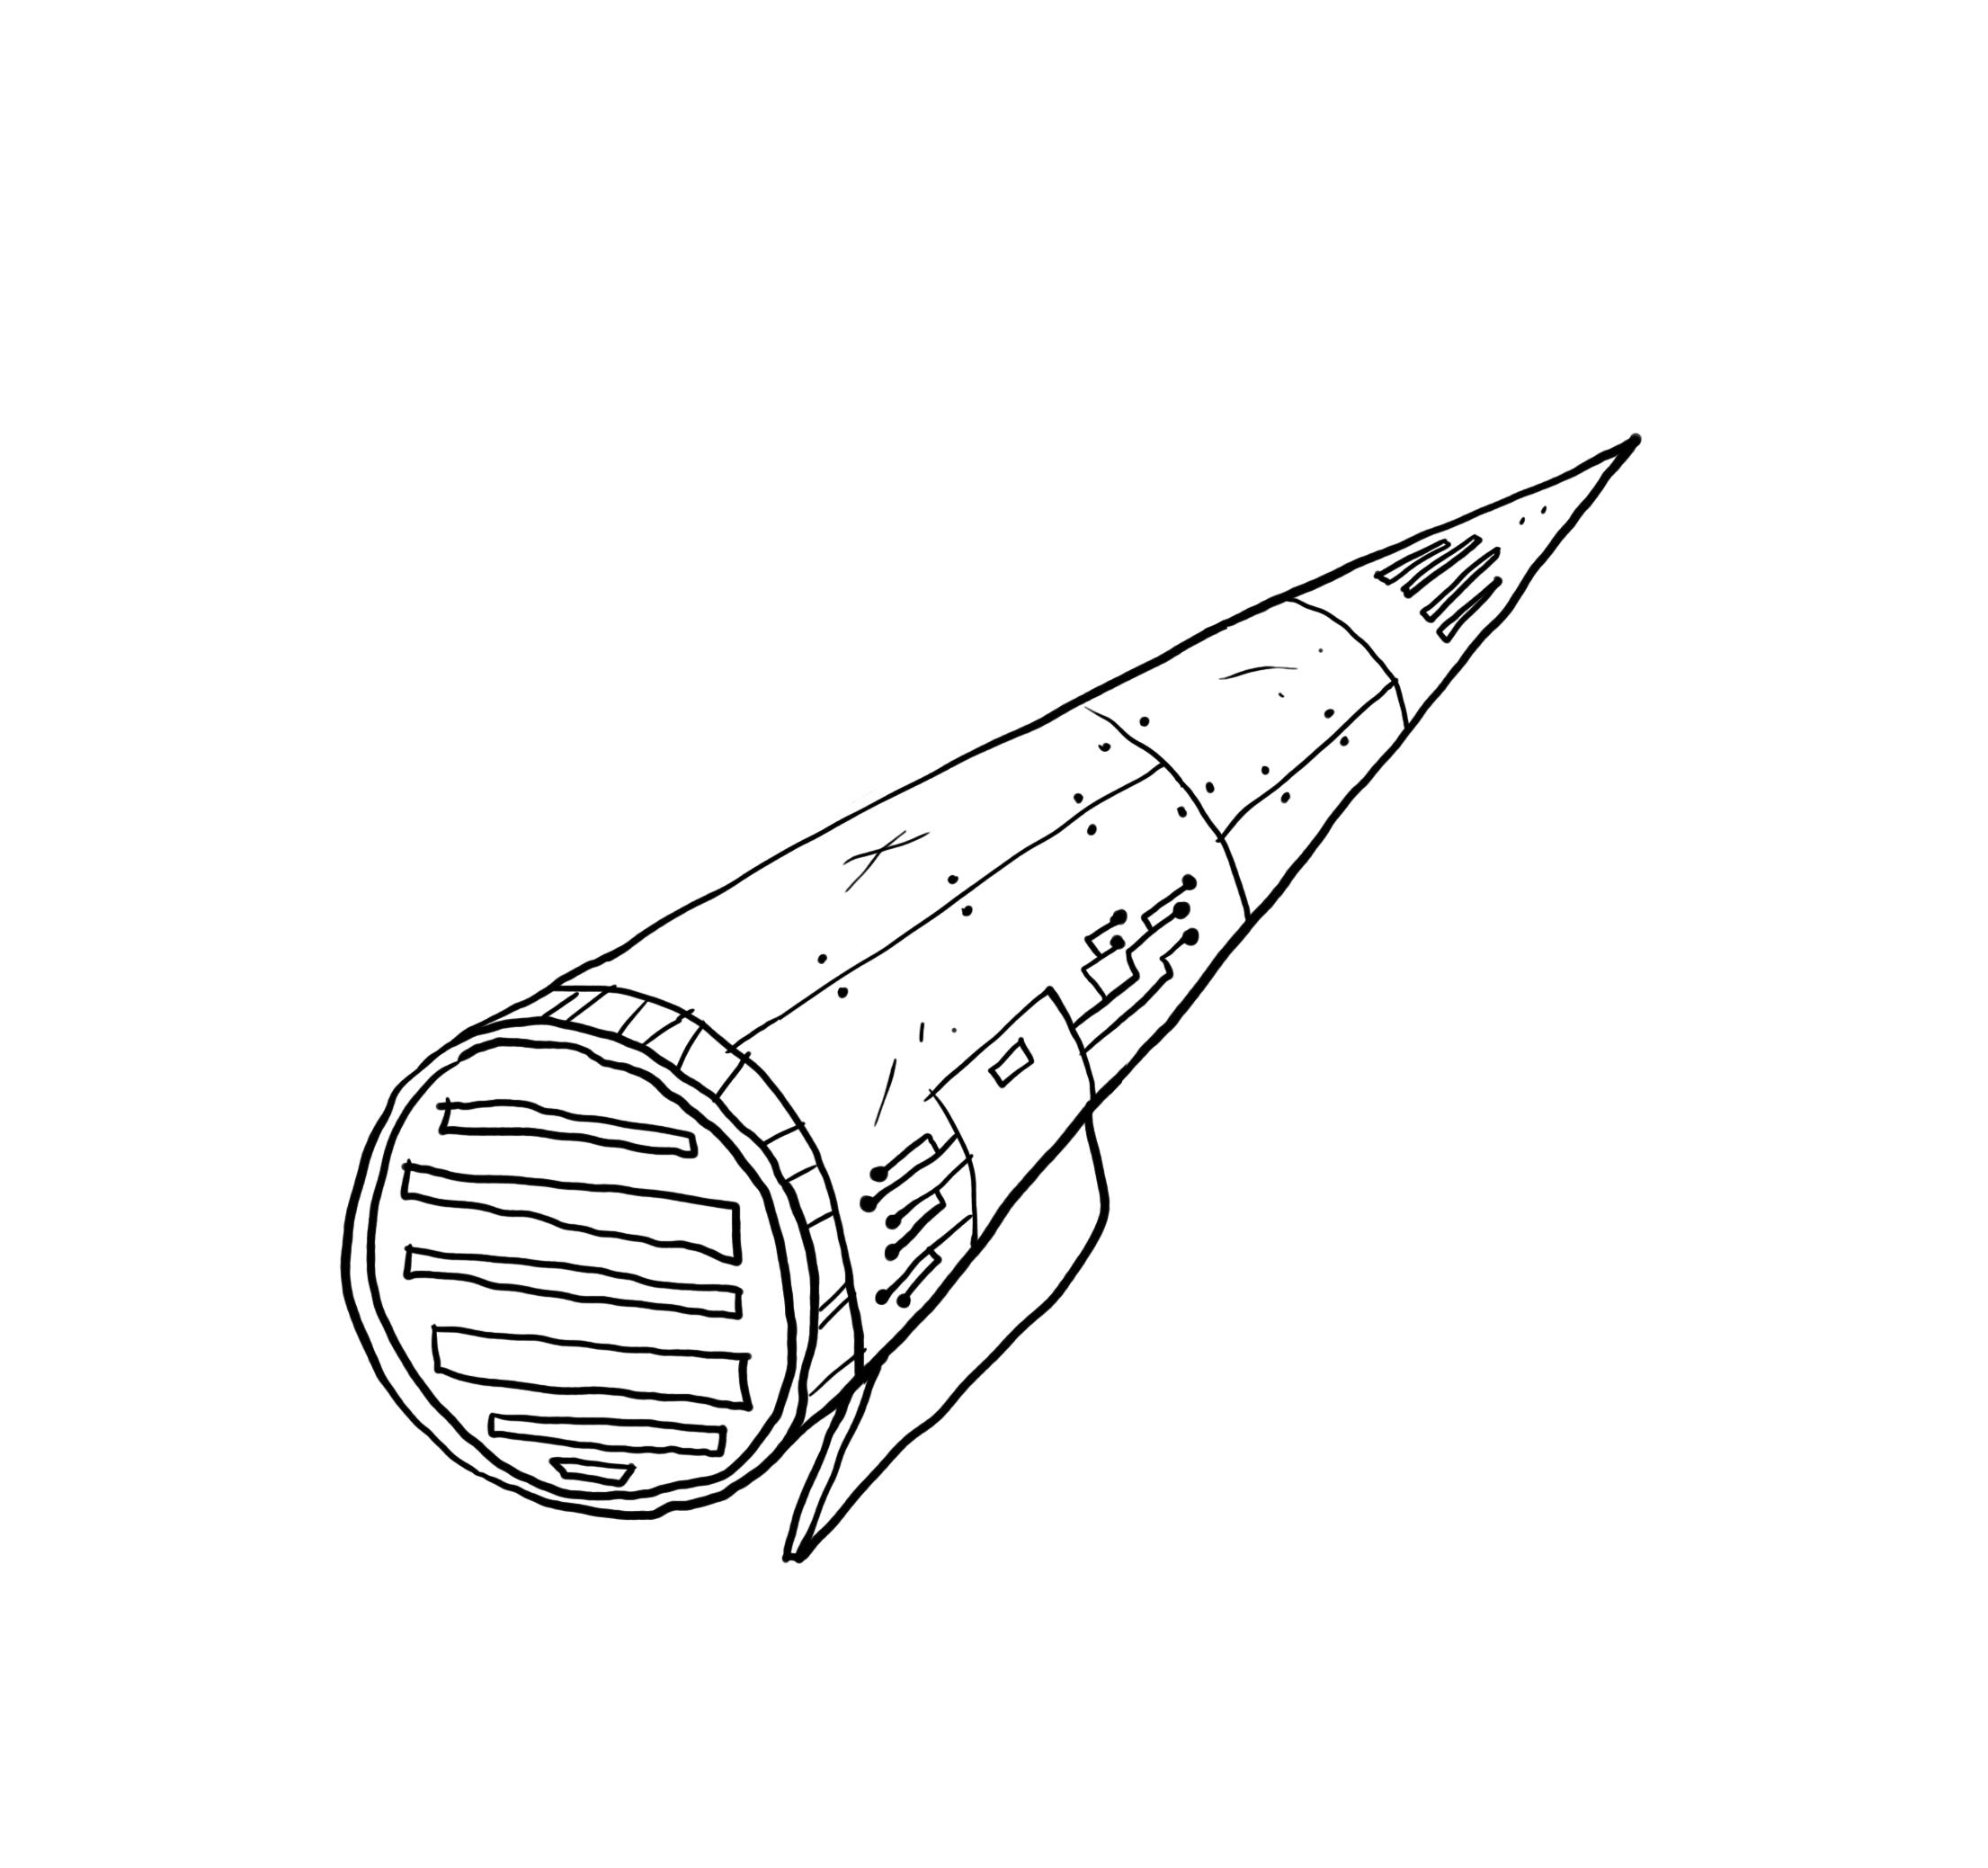 125_058_rocket.png